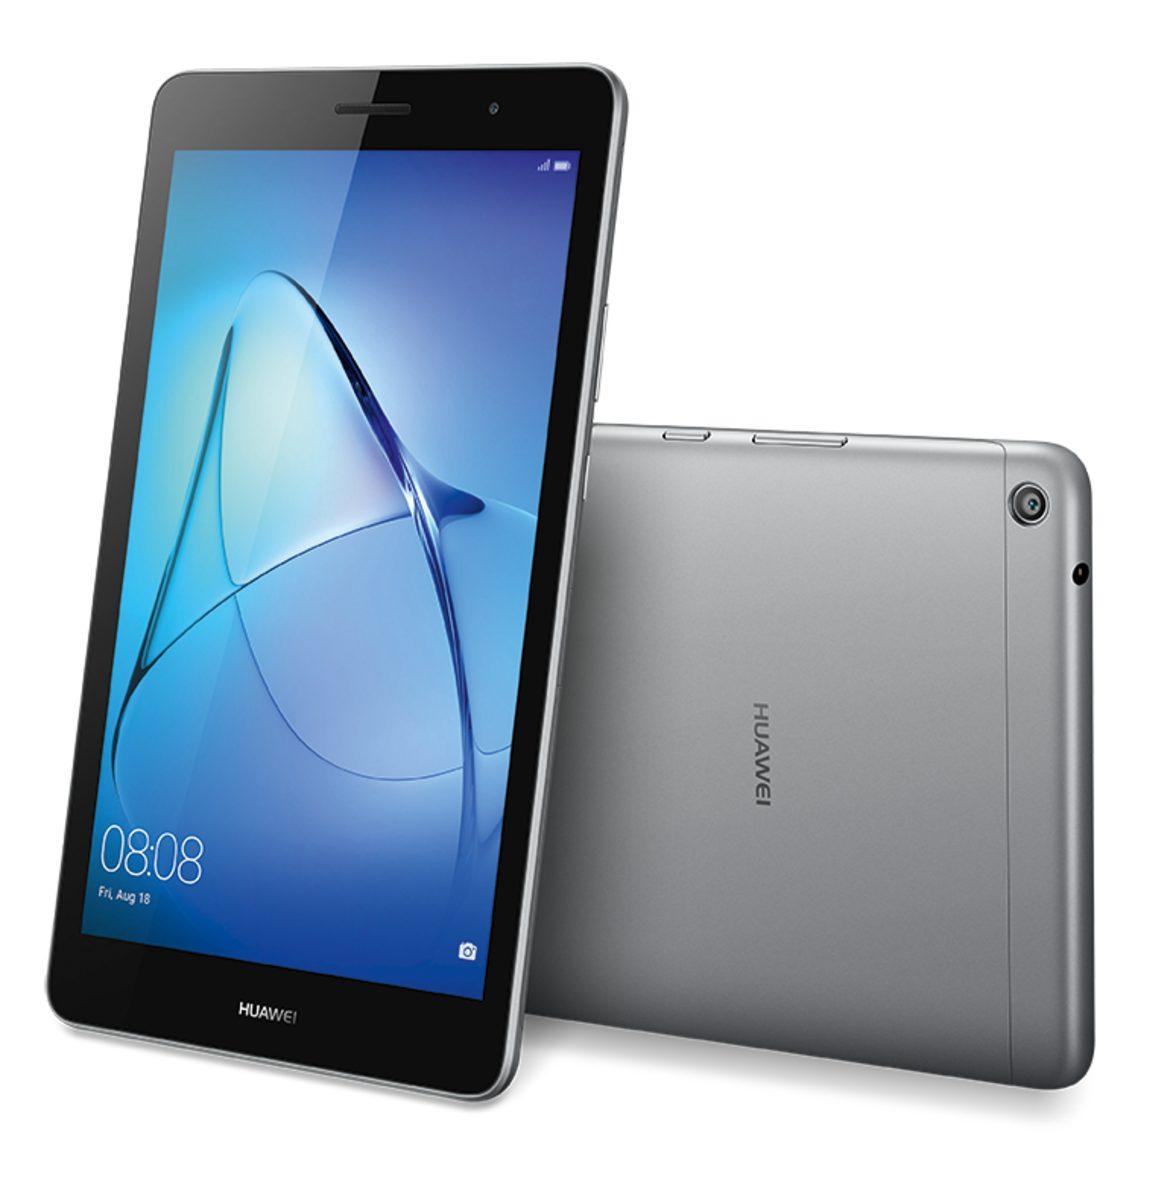 huawei tablet mediapad t3 wifi 2 16gb auf raten kaufen. Black Bedroom Furniture Sets. Home Design Ideas